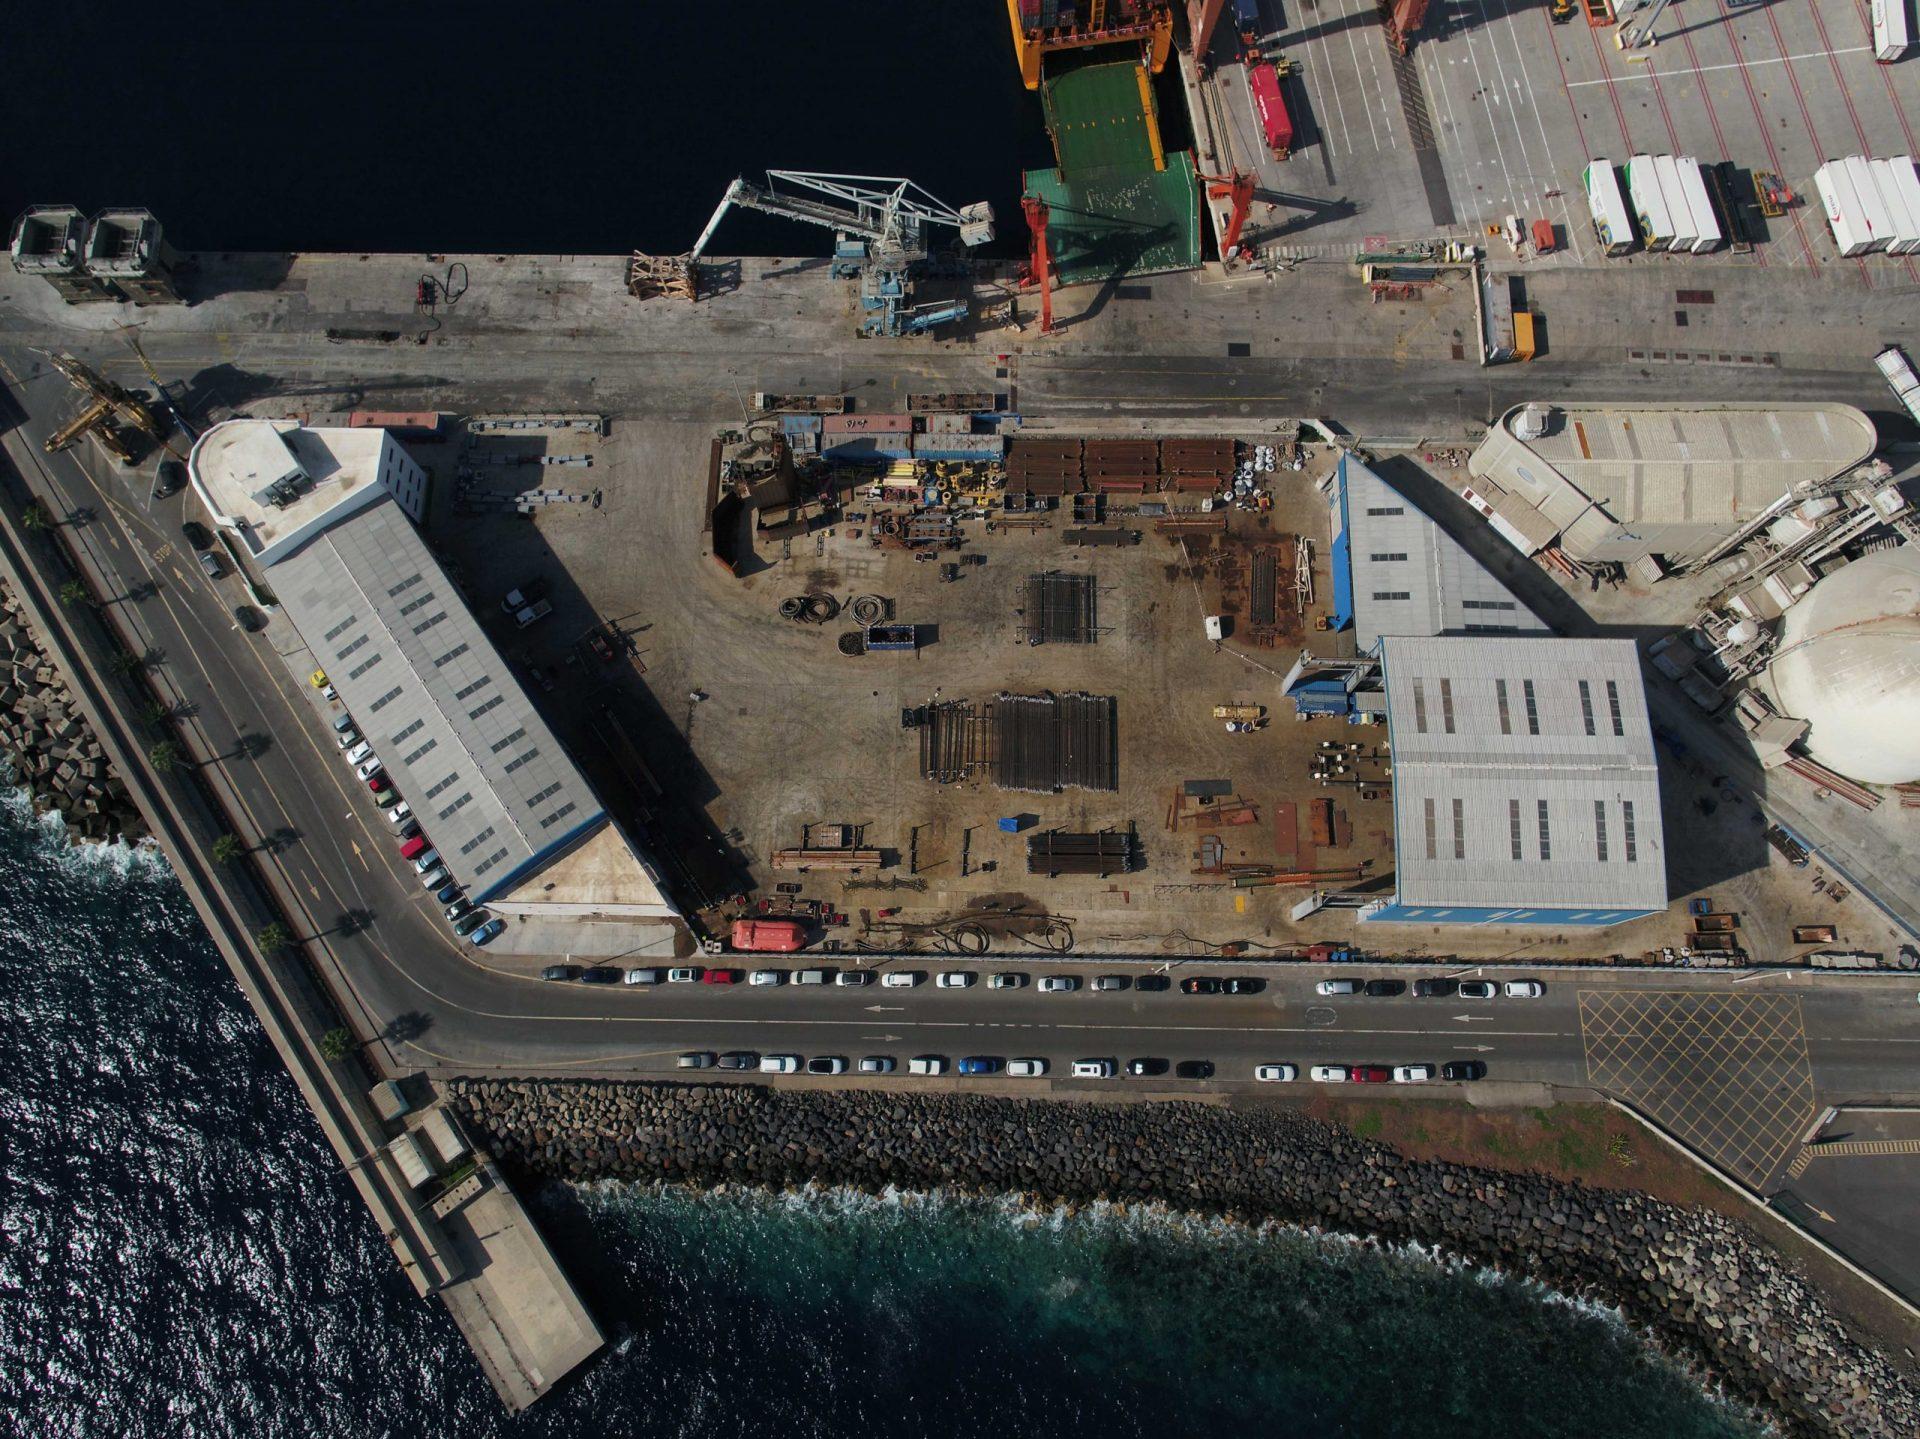 Tenerife shipyards Yard for subsea piles fabrication